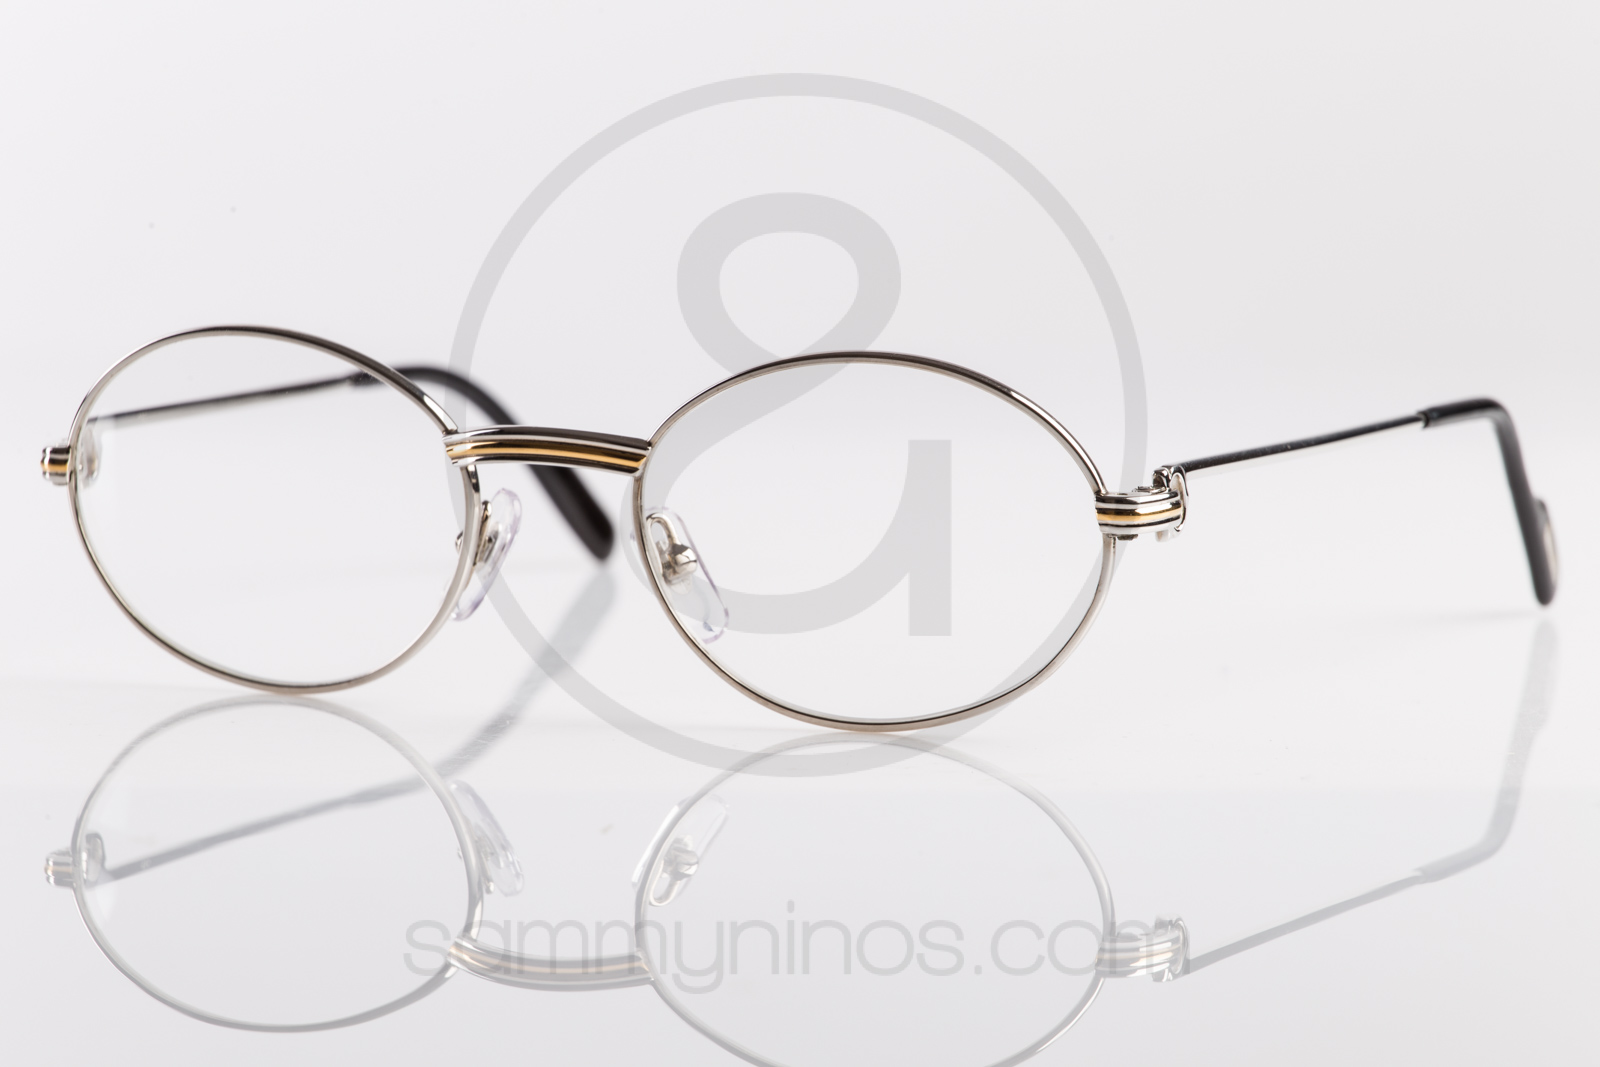 0406879dceef Cartier st. Honoré platine 51-20 – Sammy   Nino s Store